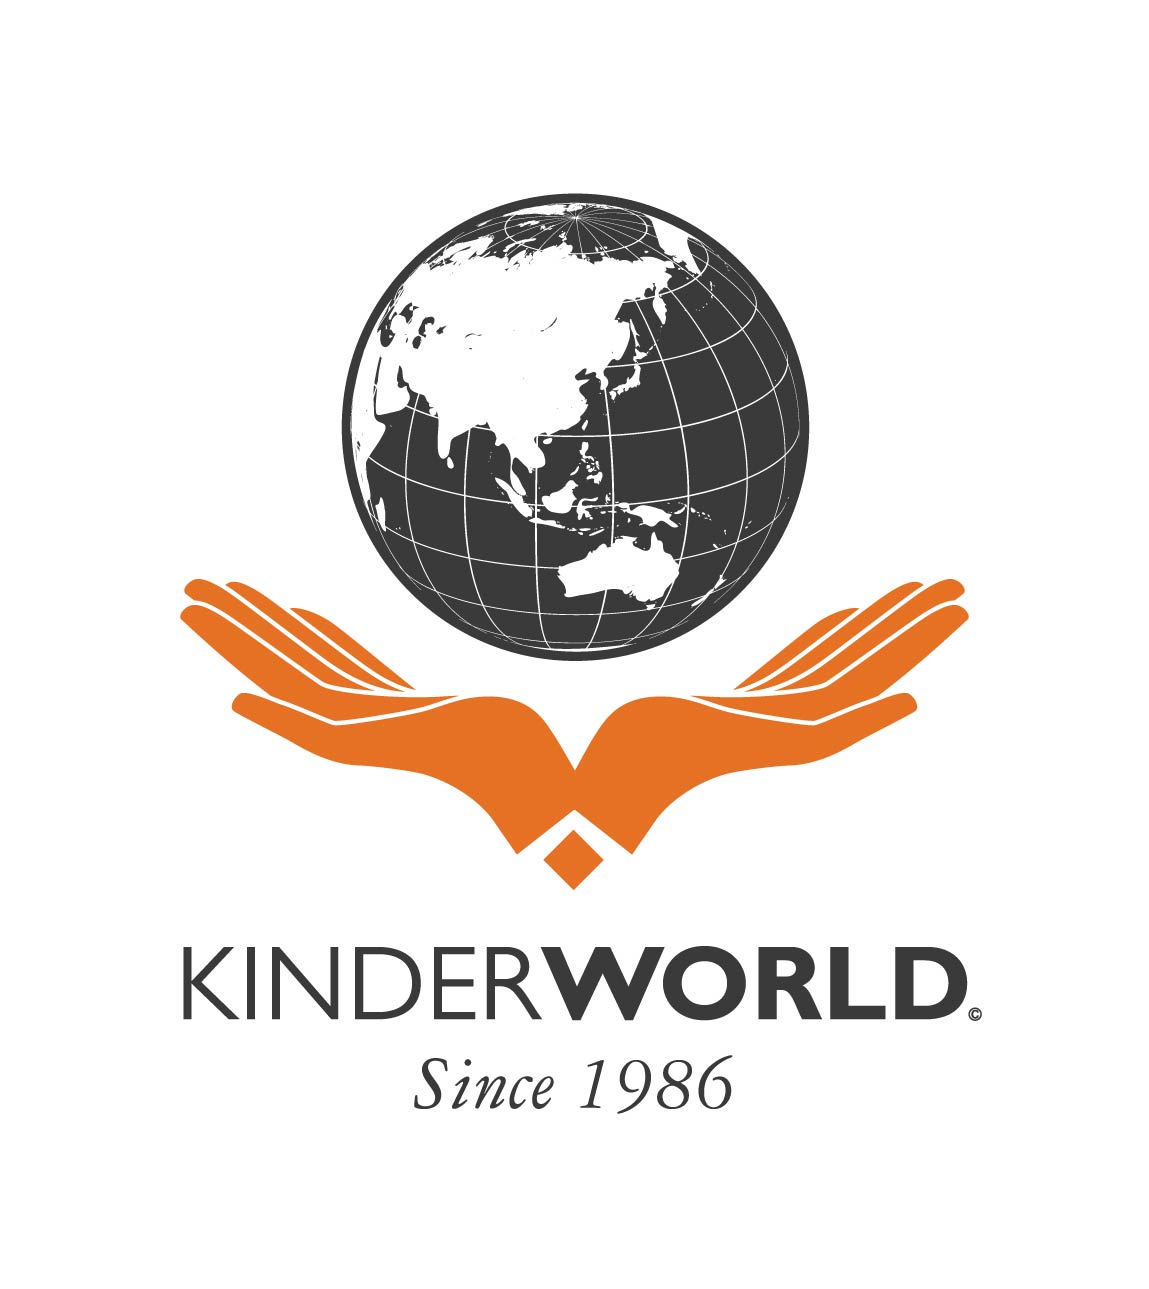 KINDERWORLD INTERNATIONAL GROUP (SINGAPORE INTERNATIONAL SCHOOL SYSTEM)